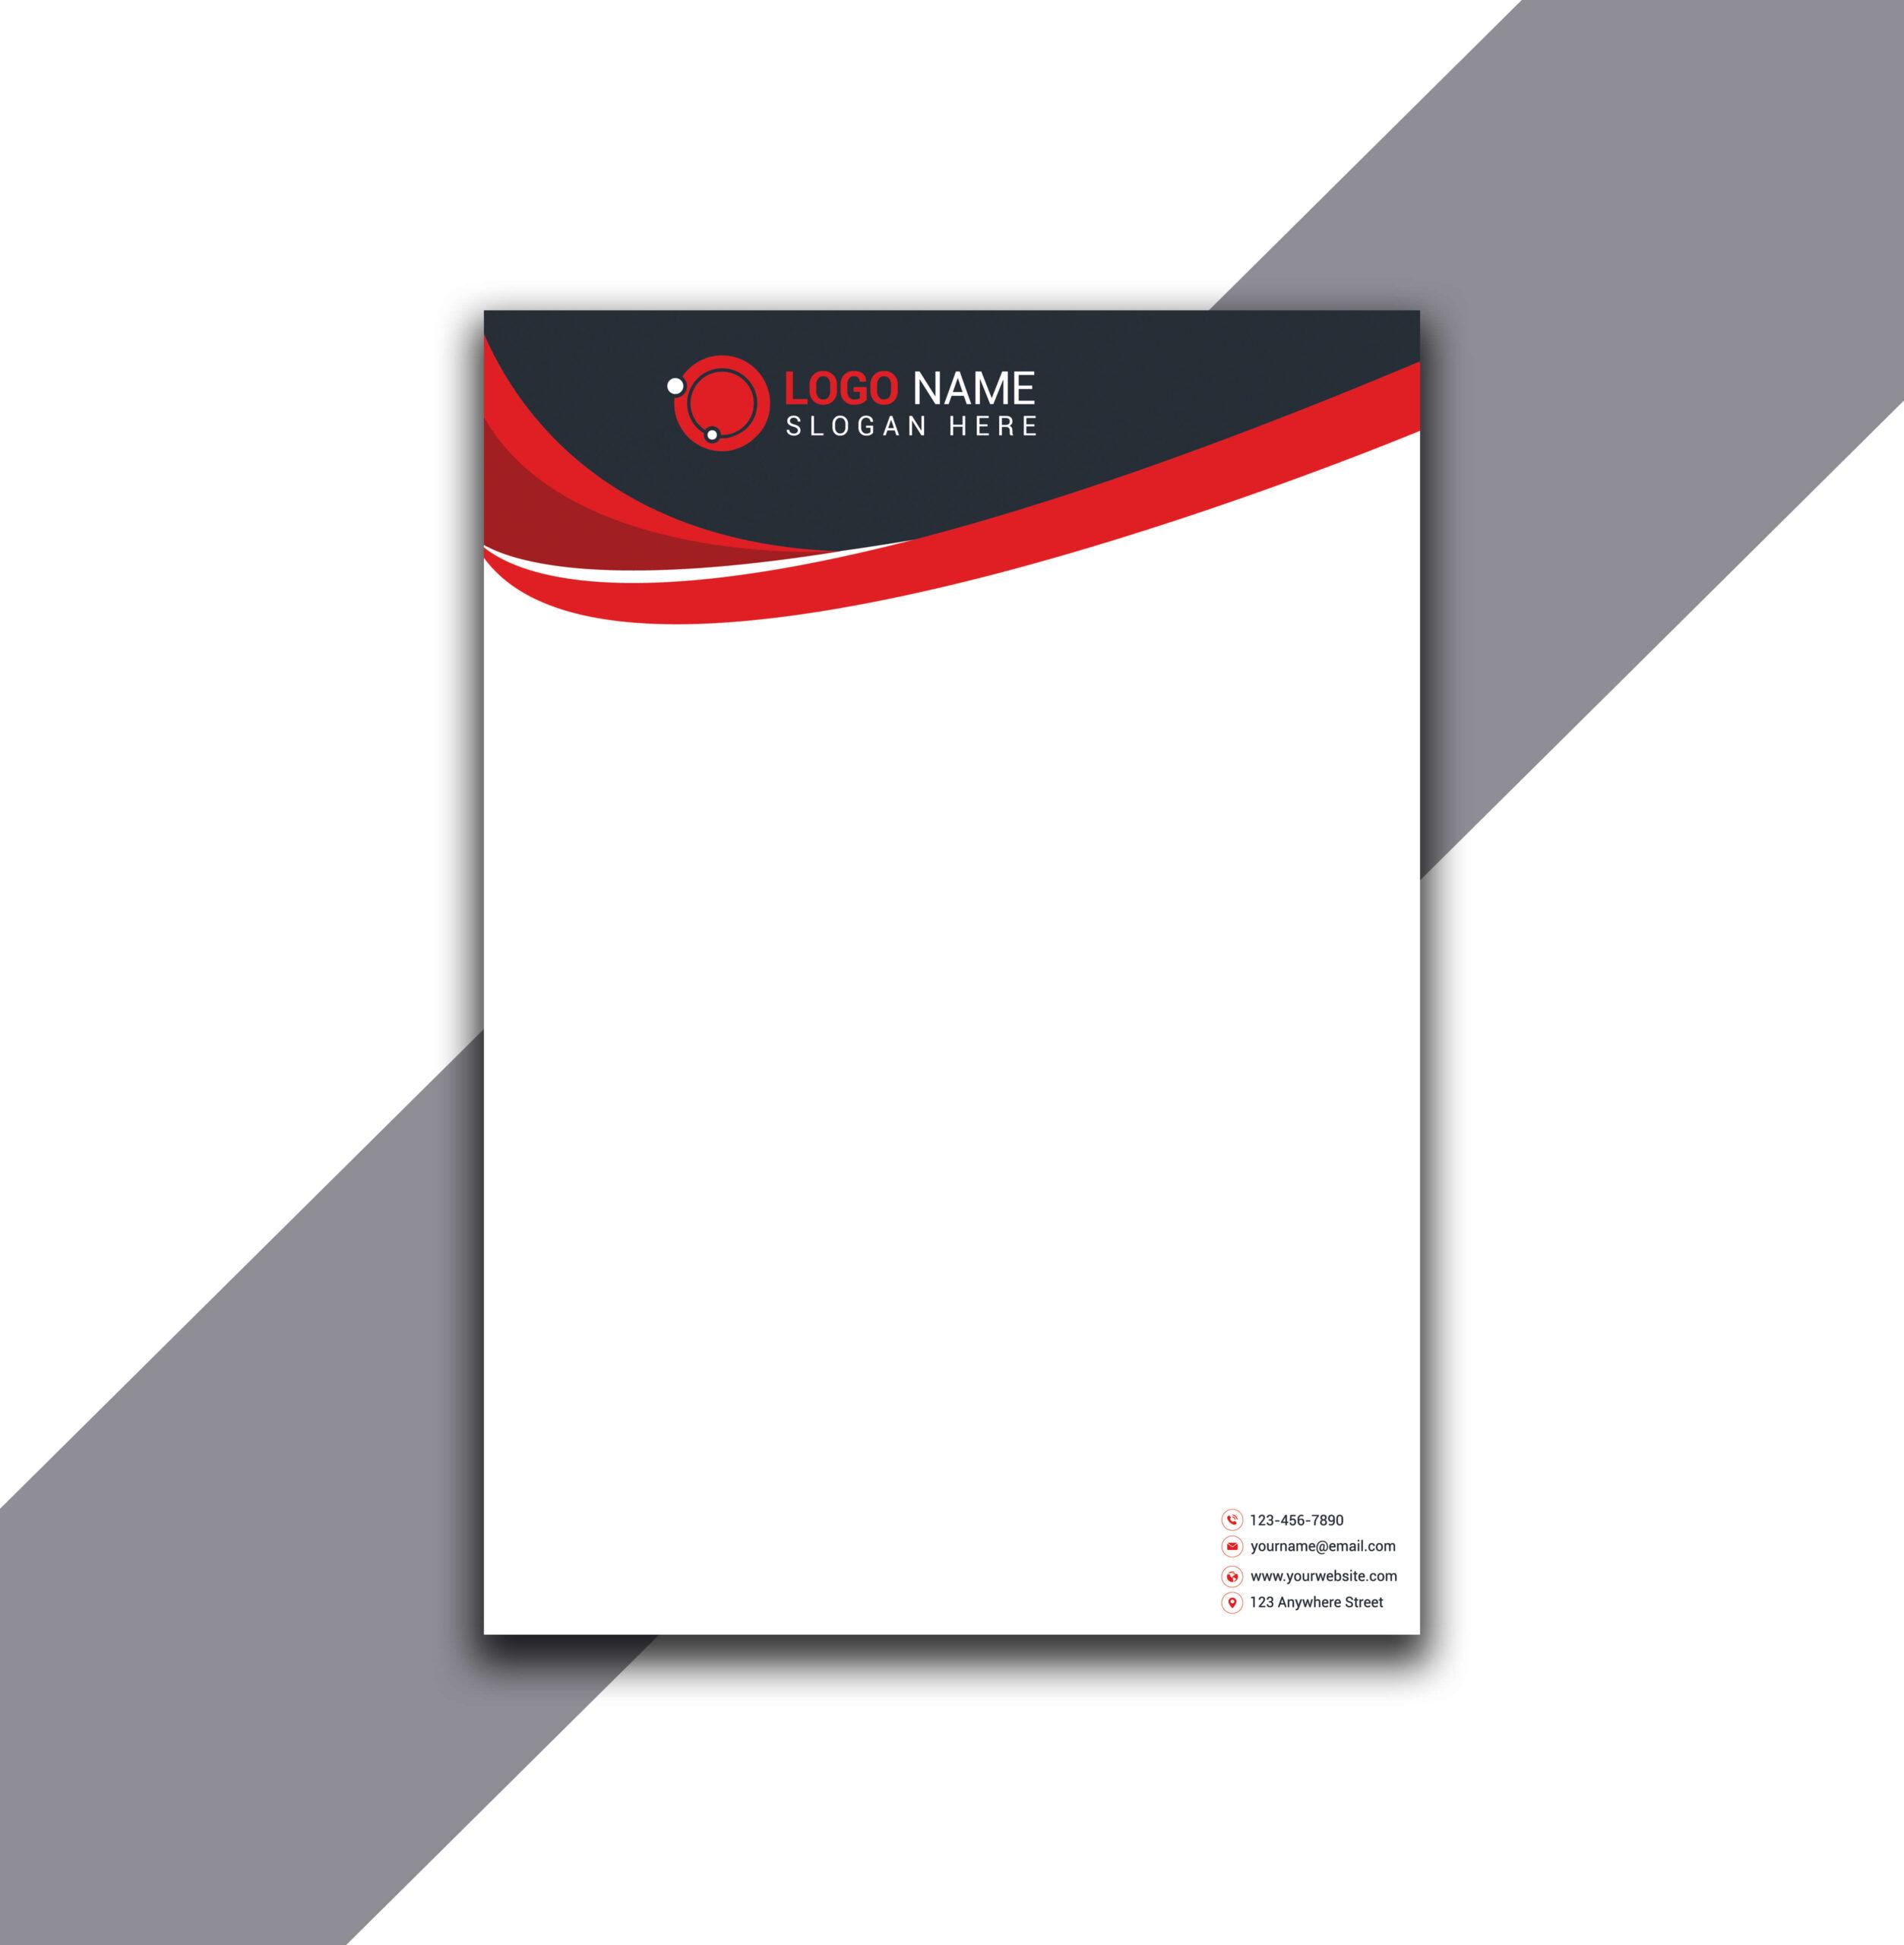 Red and Dark Gray Curvy Letterhead Design in Illustrator